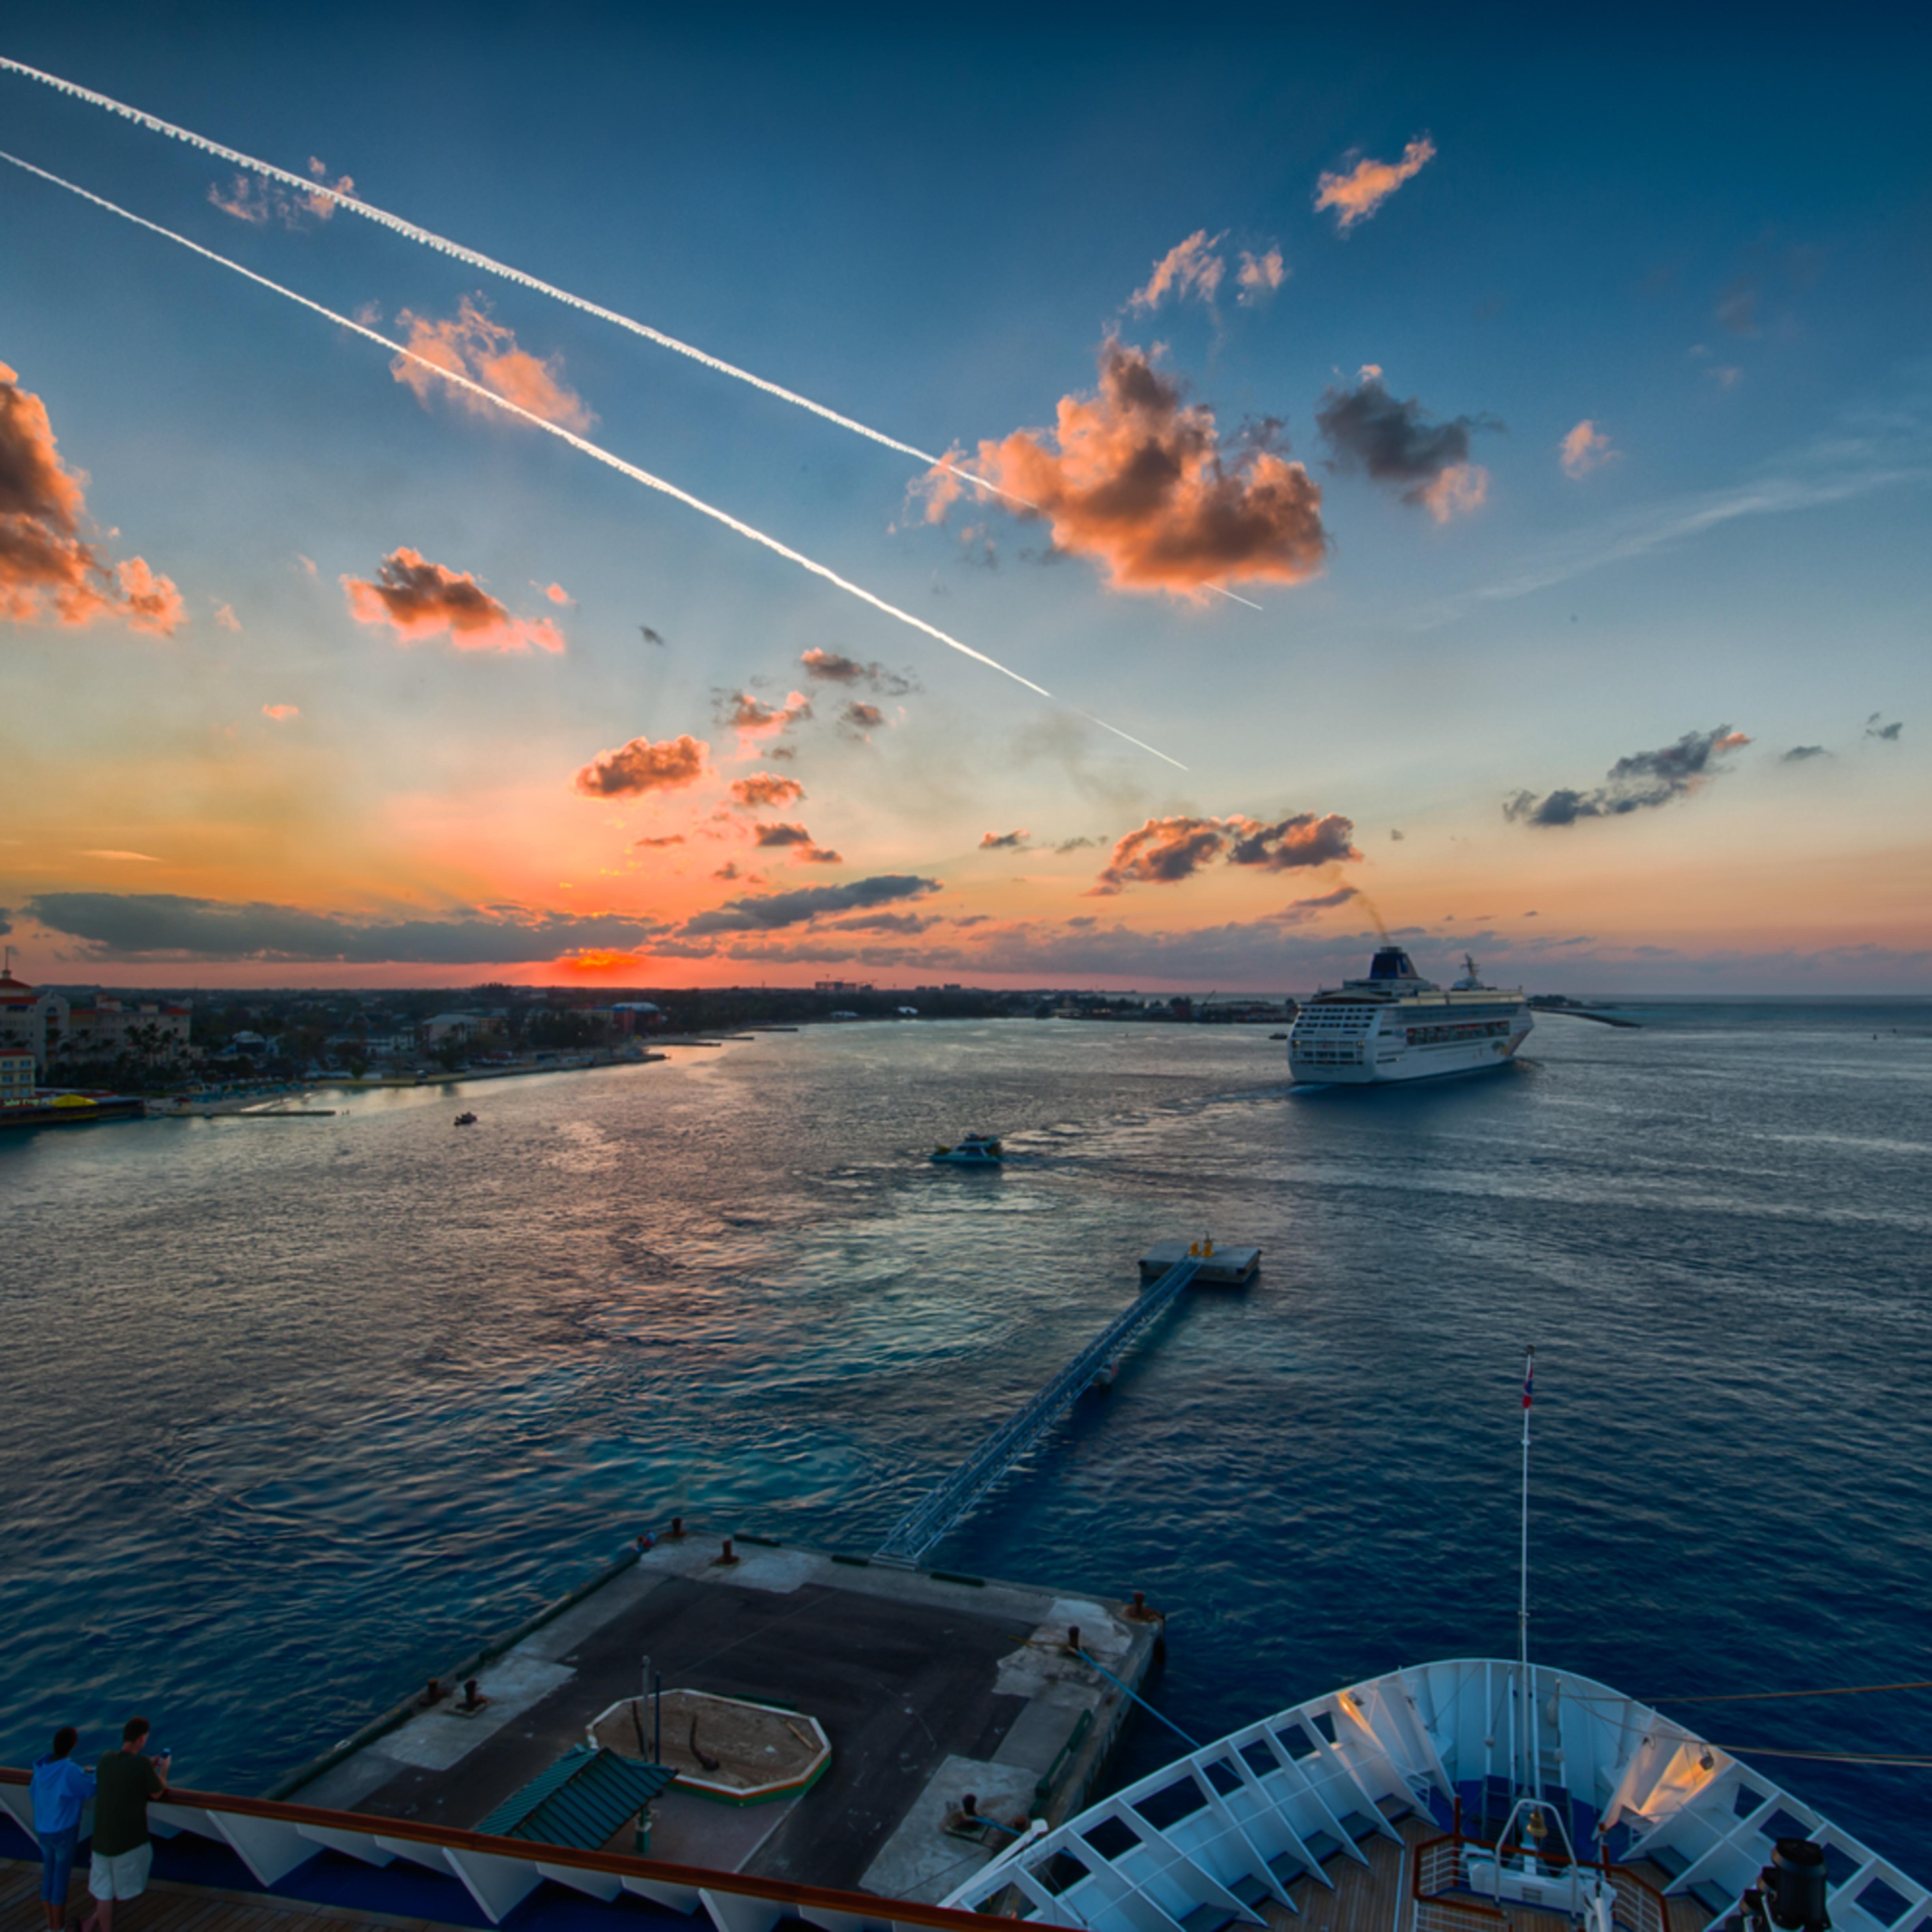 2012 11 bahama cruise 410 hdr euwxnh